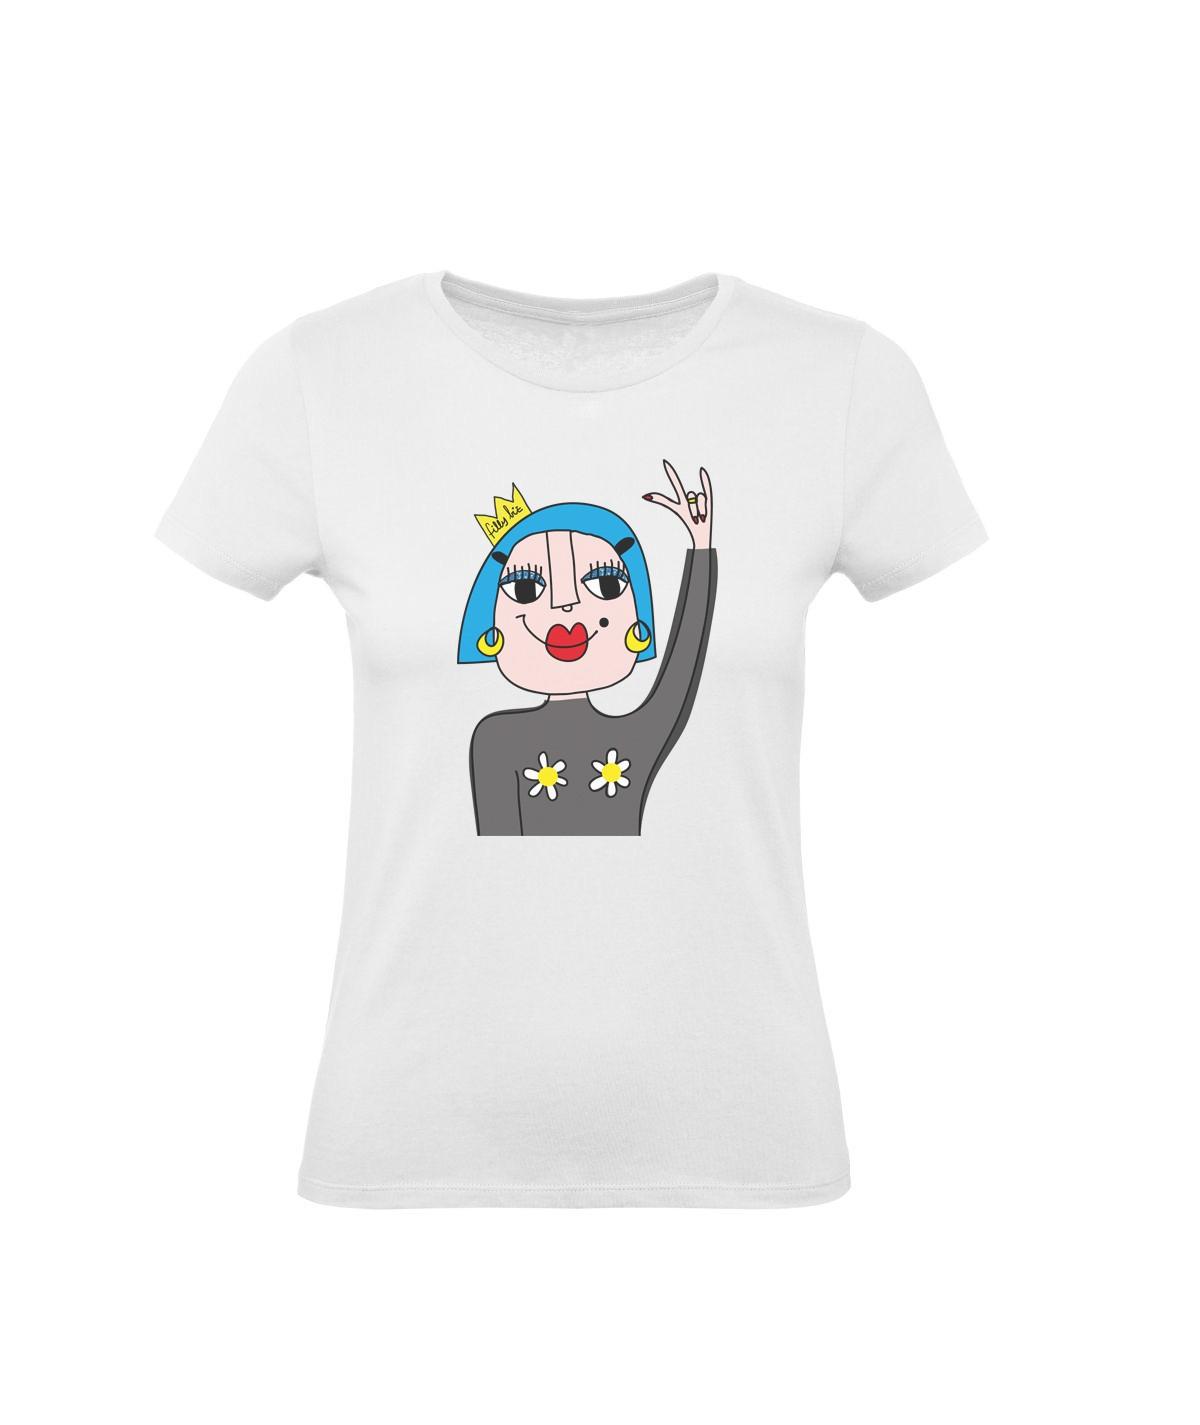 Rock 'n roll ● t-shirt...